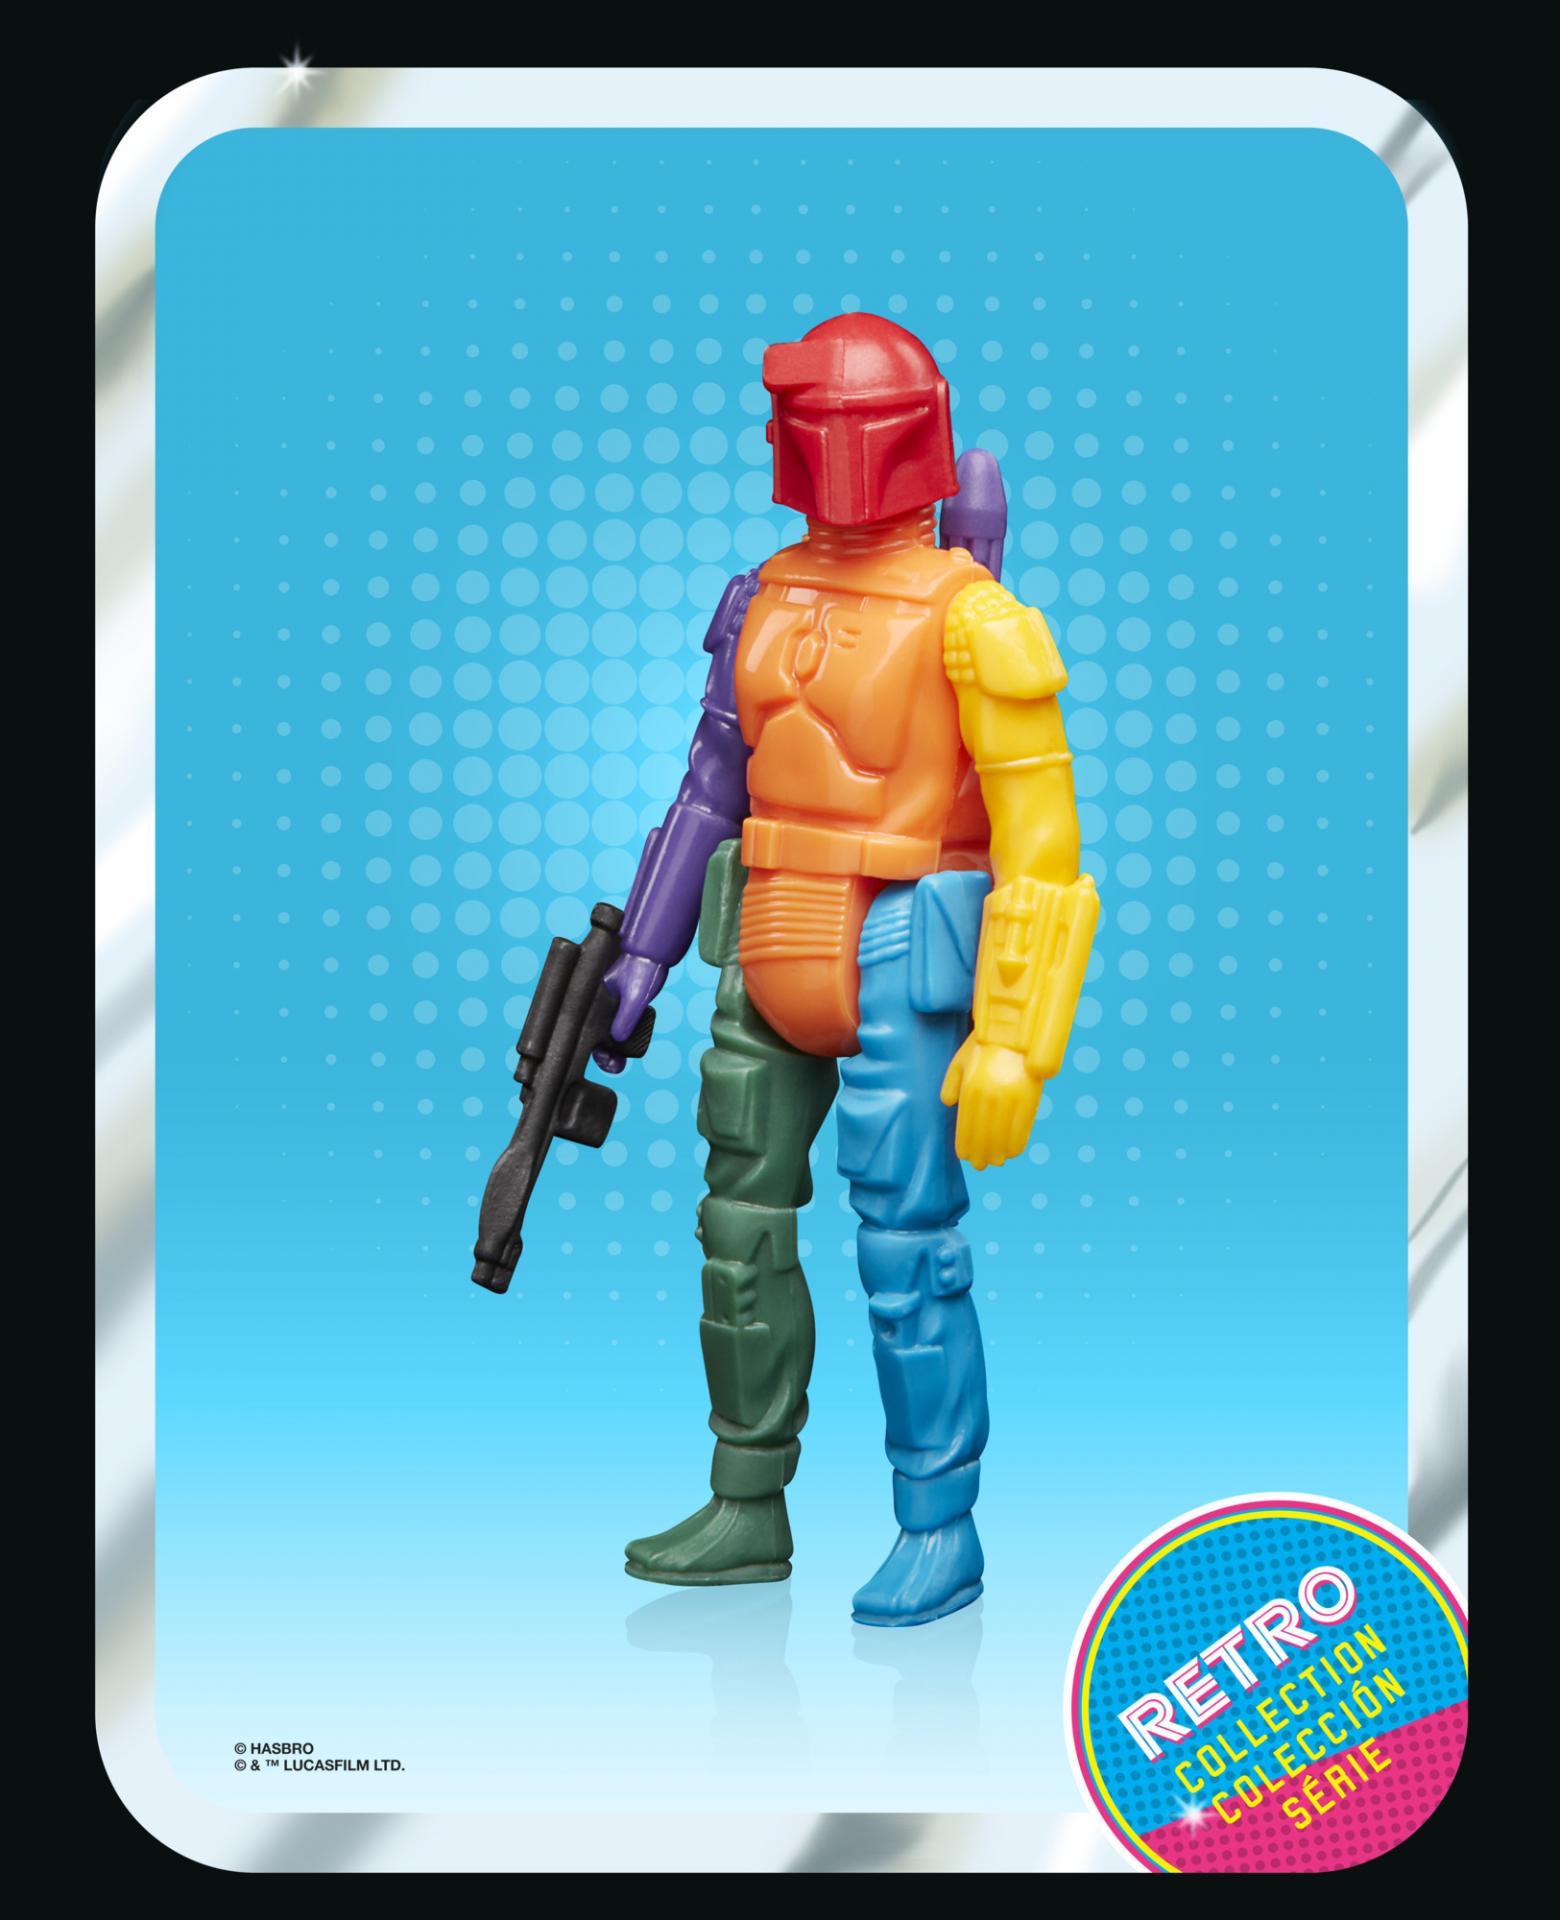 Star wars the retro collection boba fett prototype edition5